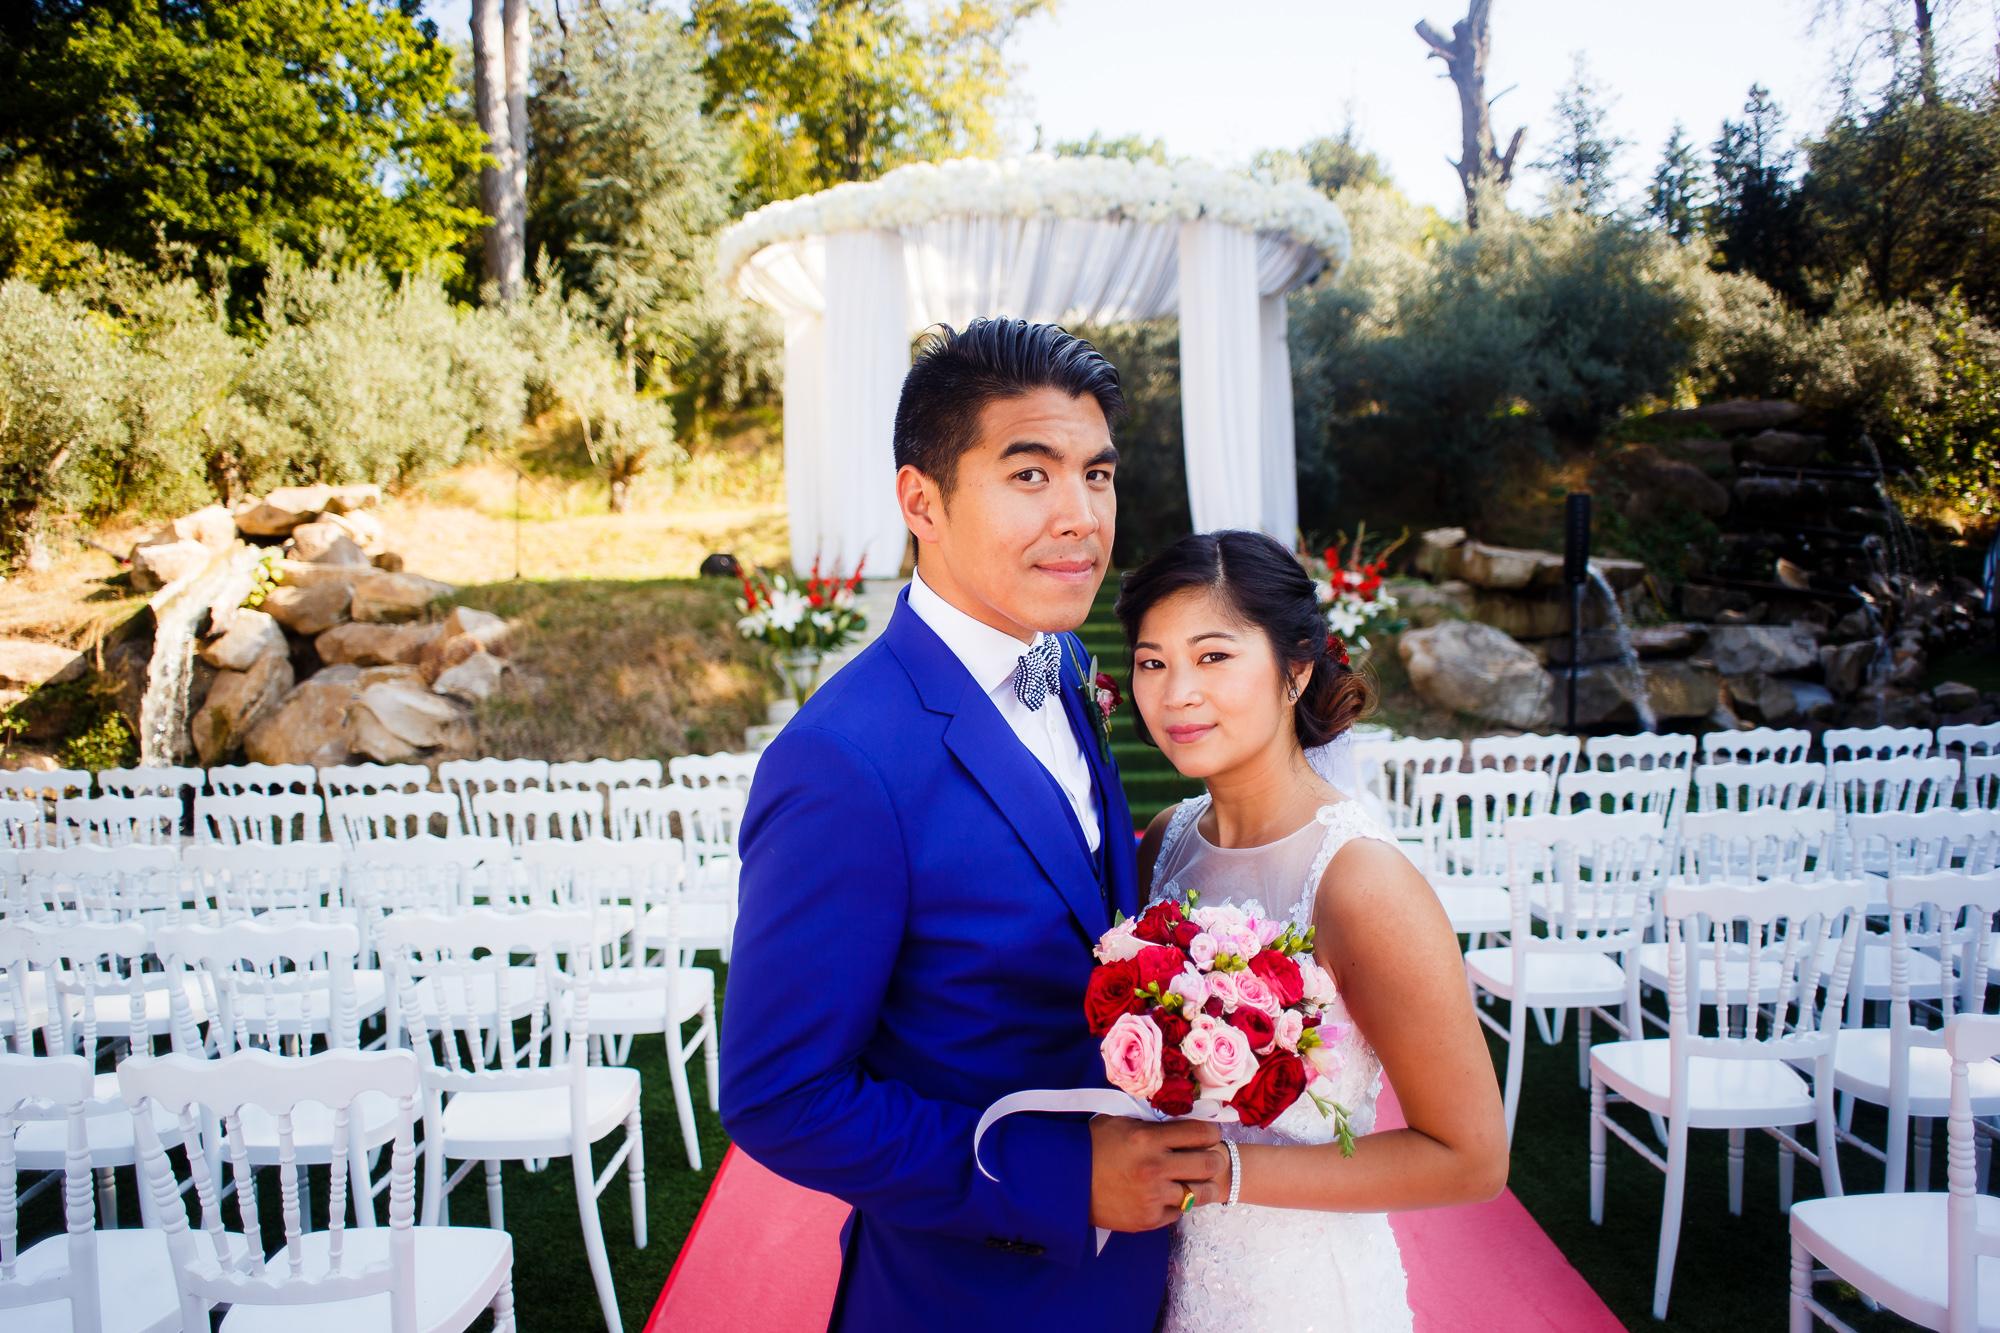 Mariage au Manoir des Cygnes couple chinois